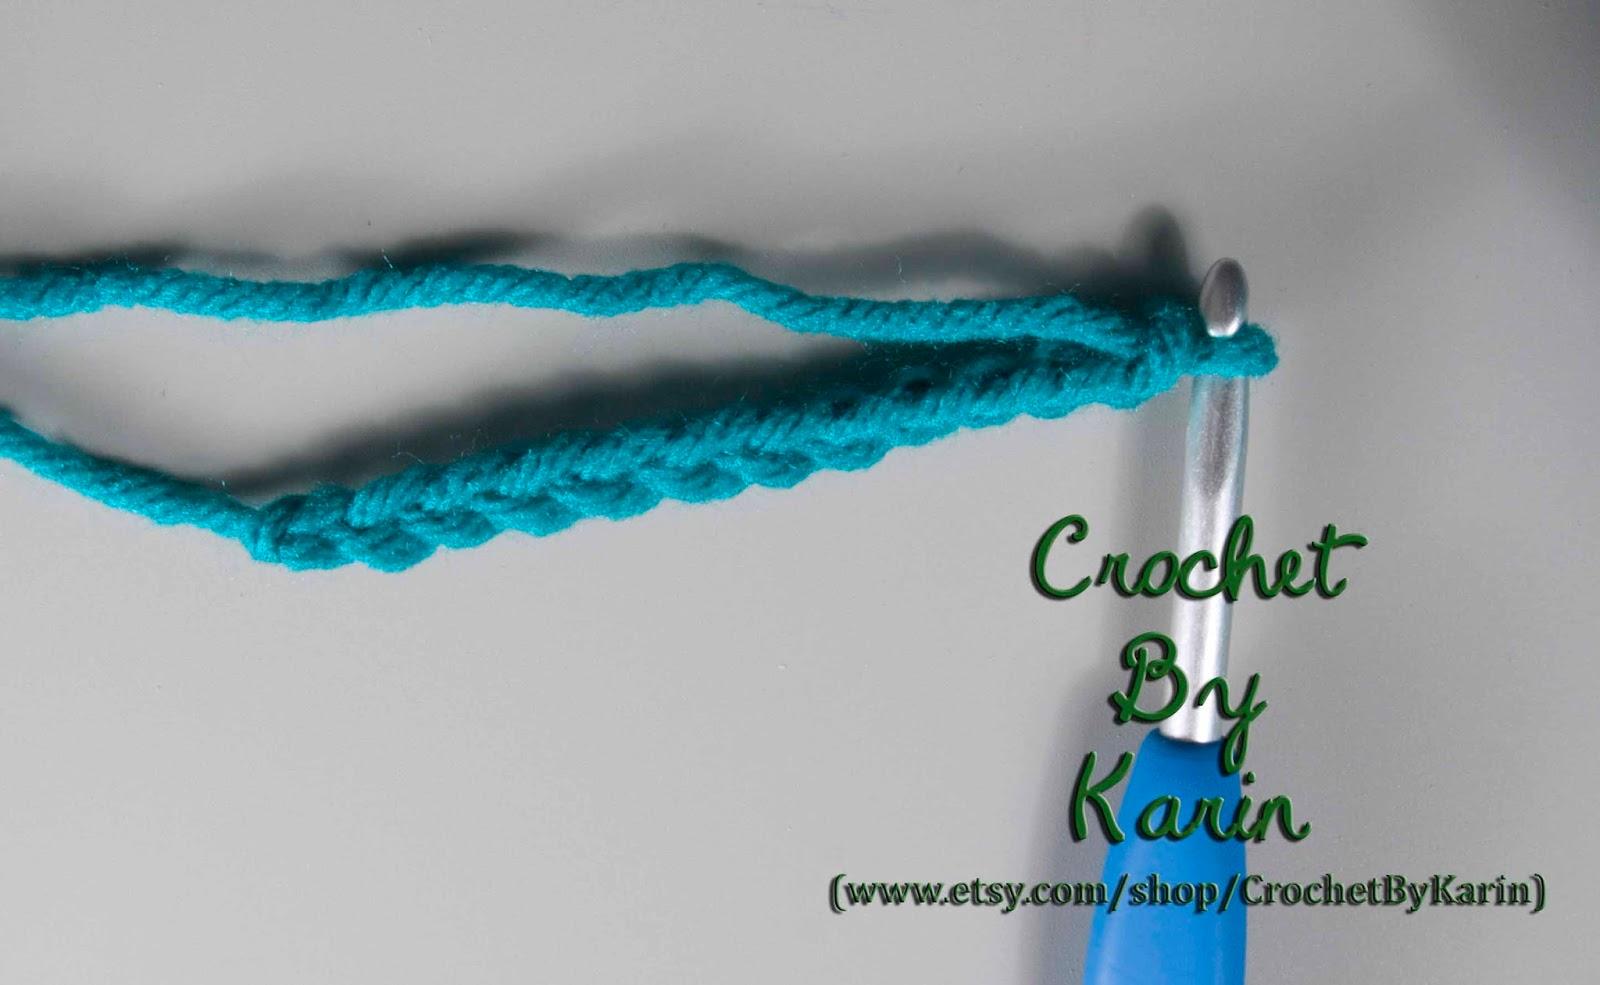 CrochetByKarin: Extended Double Crochet